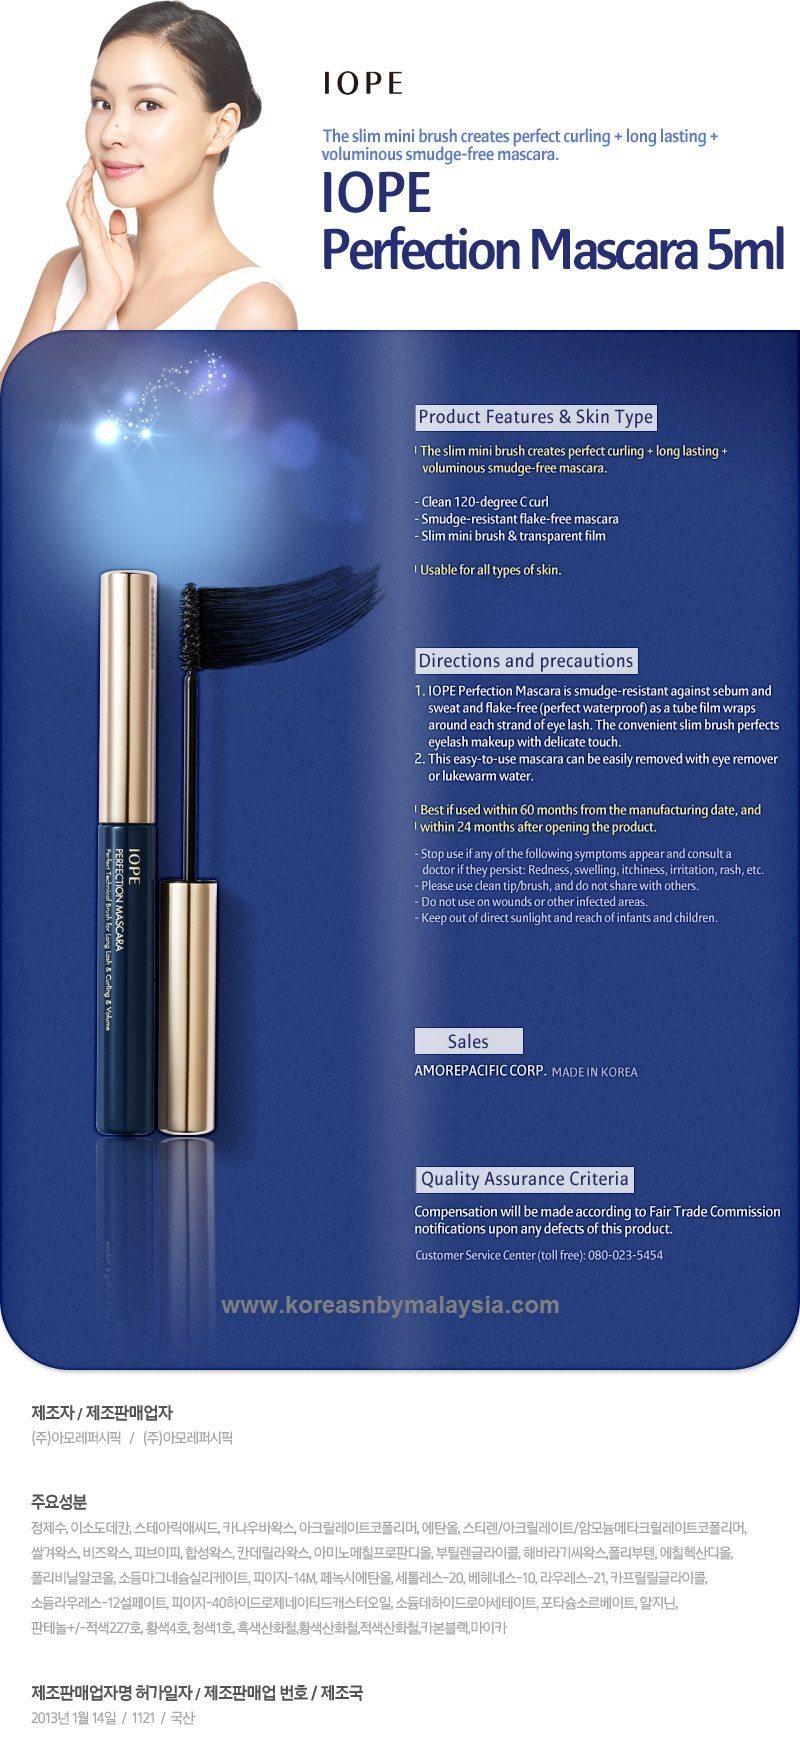 IOPE Perfection Mascara 5ml